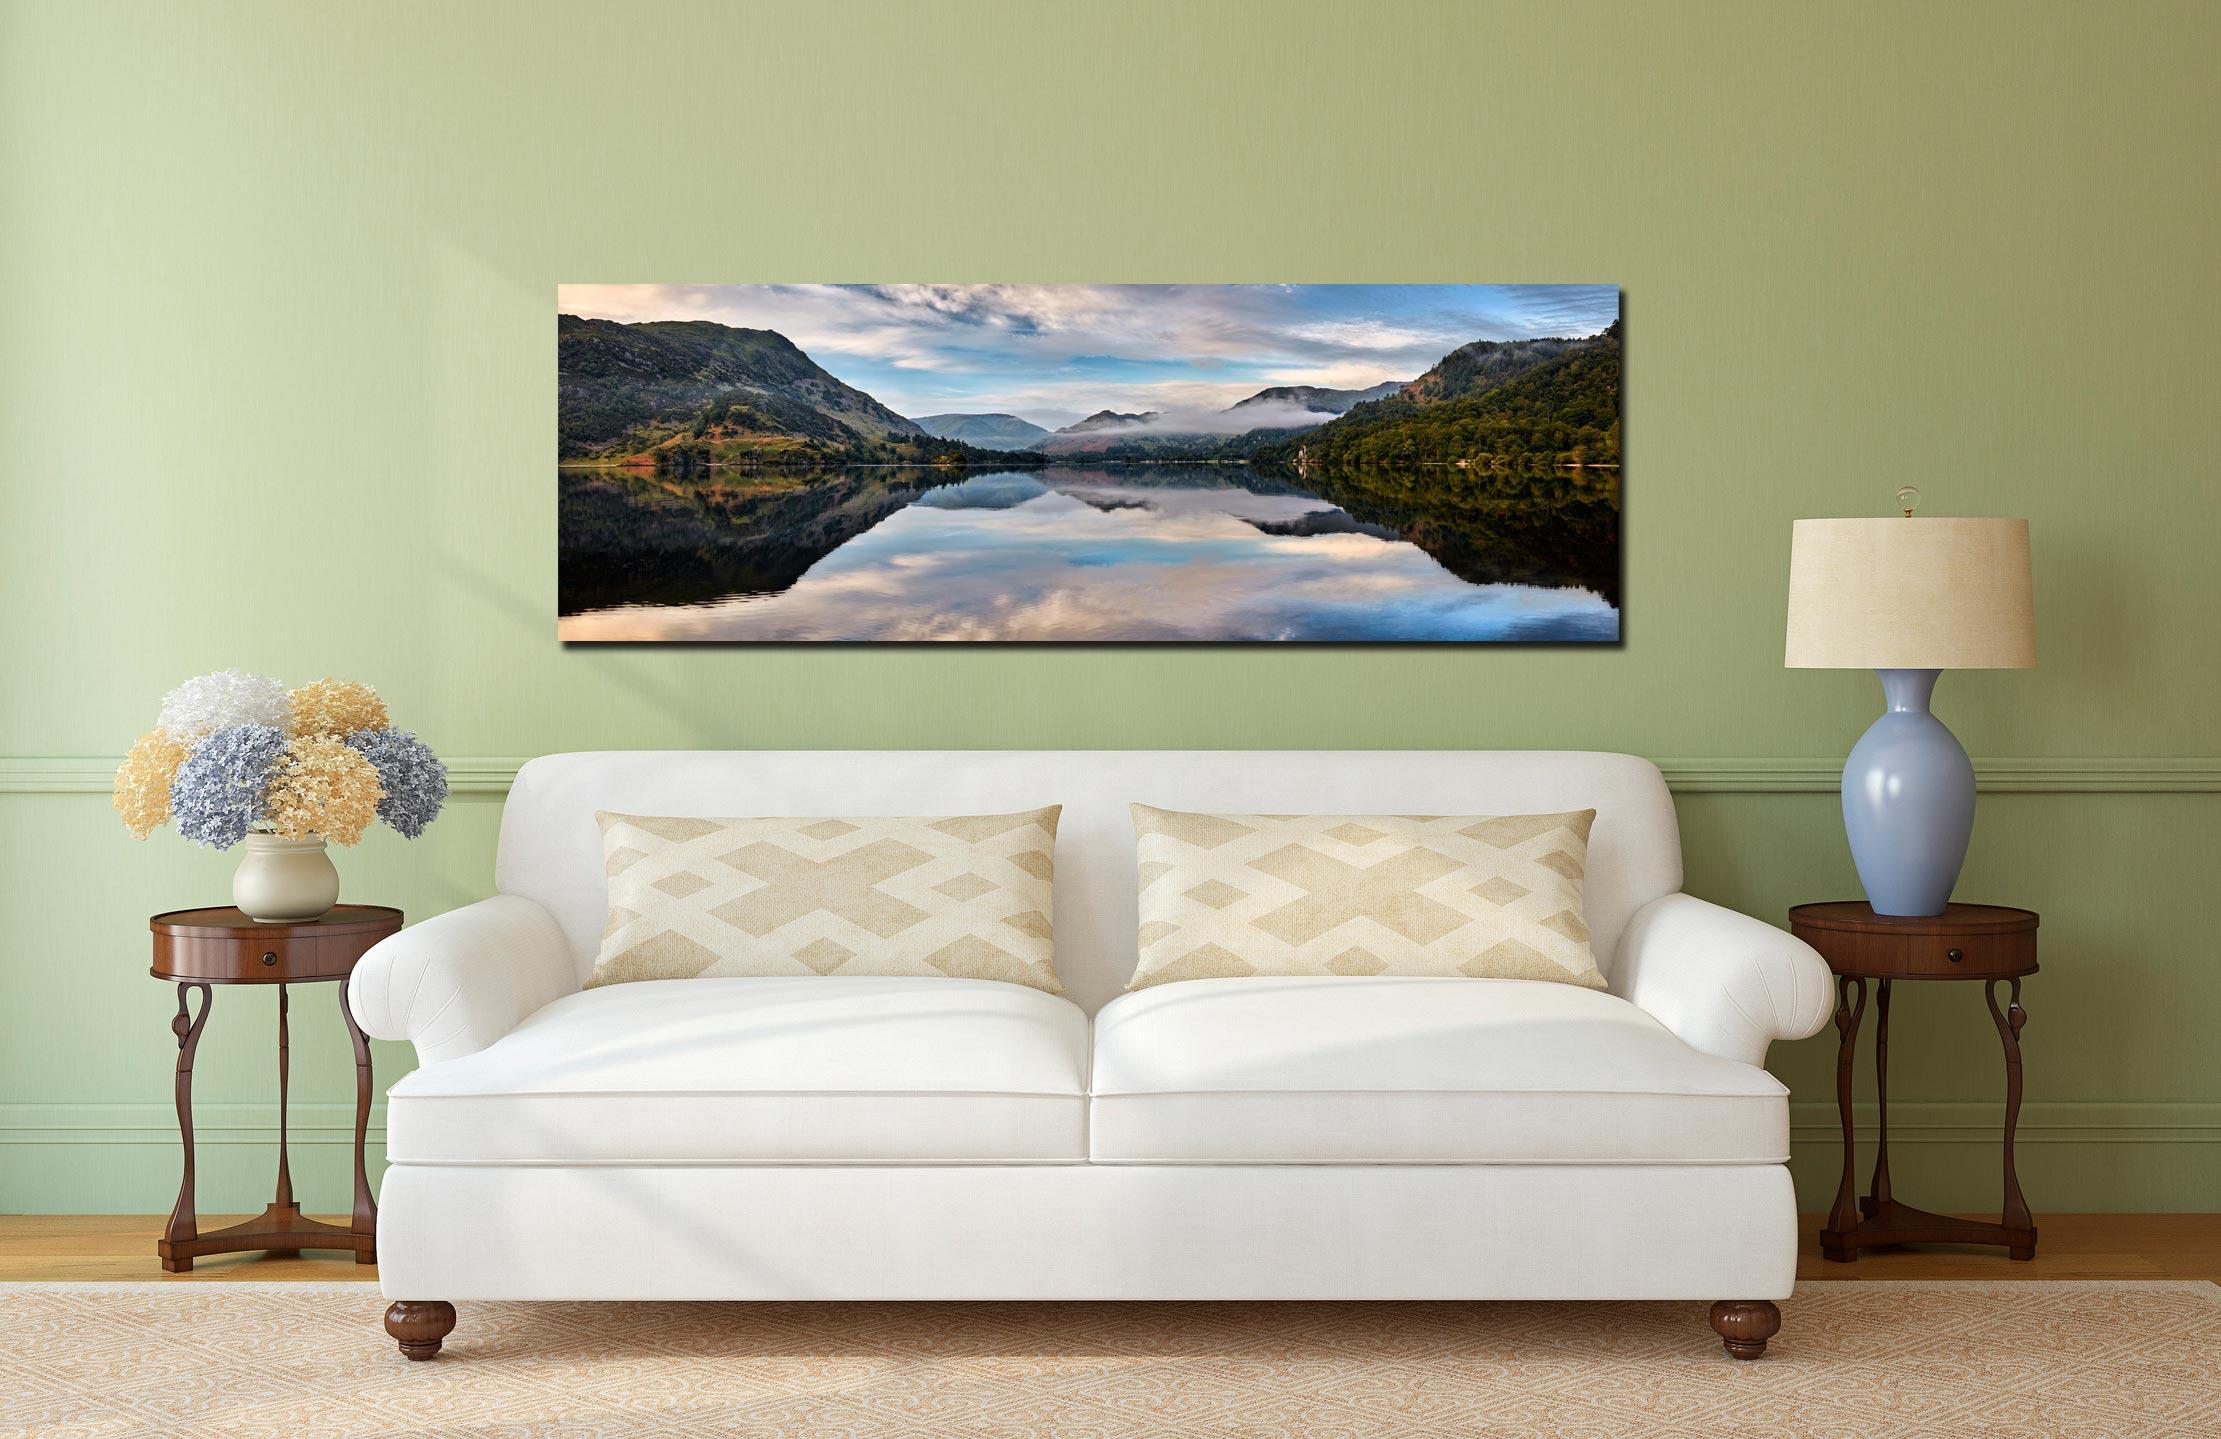 Ullswater Calmness - Print Aluminium Backing With Acrylic Glazing on Wall